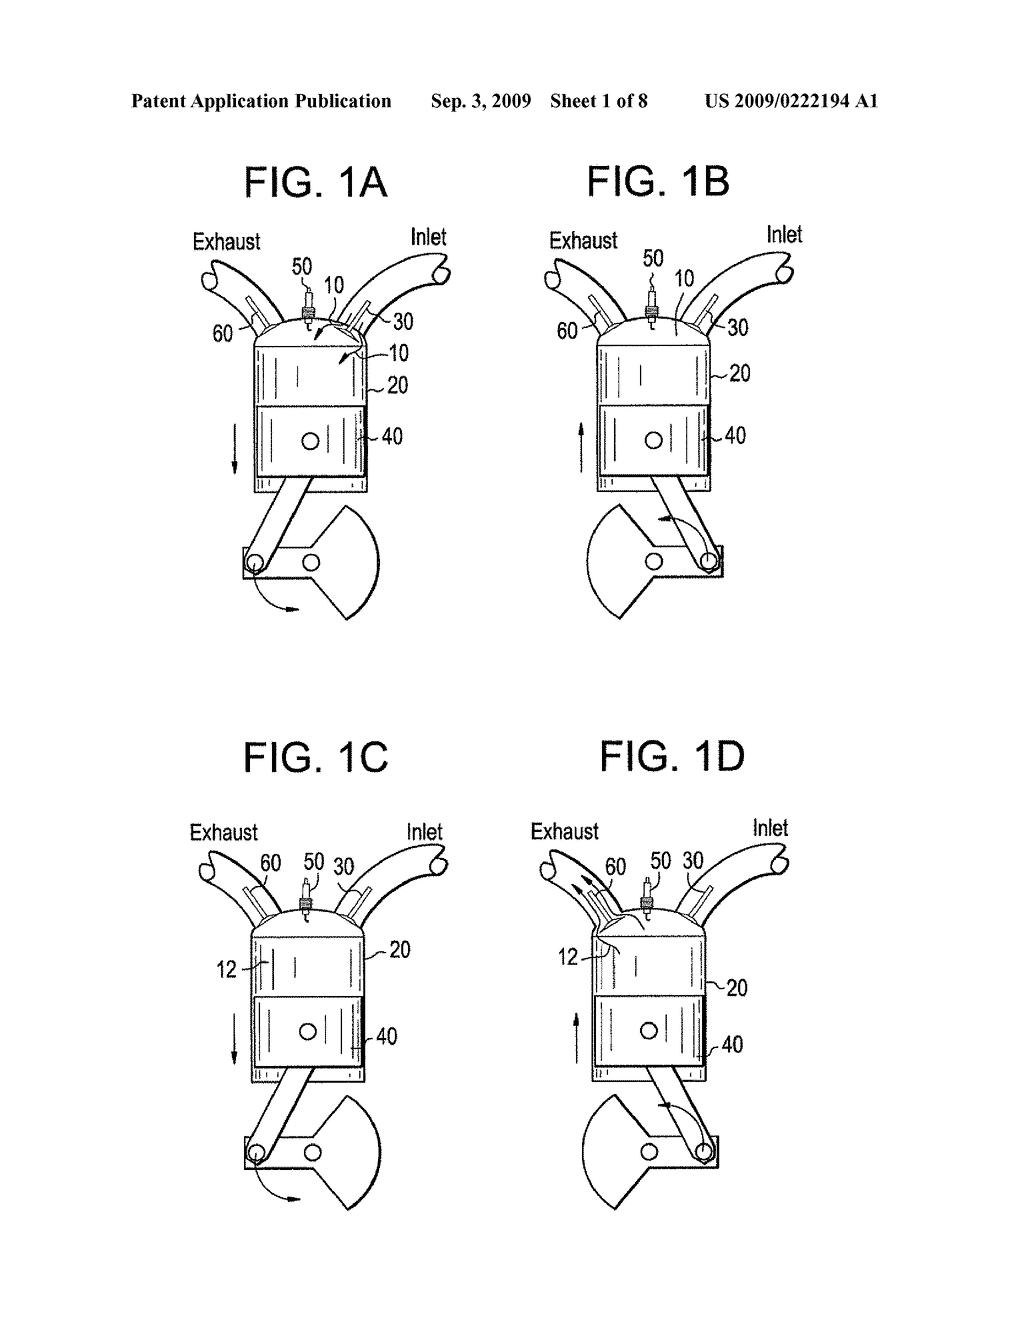 adaptive miller cycle engine diagram, schematic, and image 02 carnot engine cycle miller cycle engine diagram #11